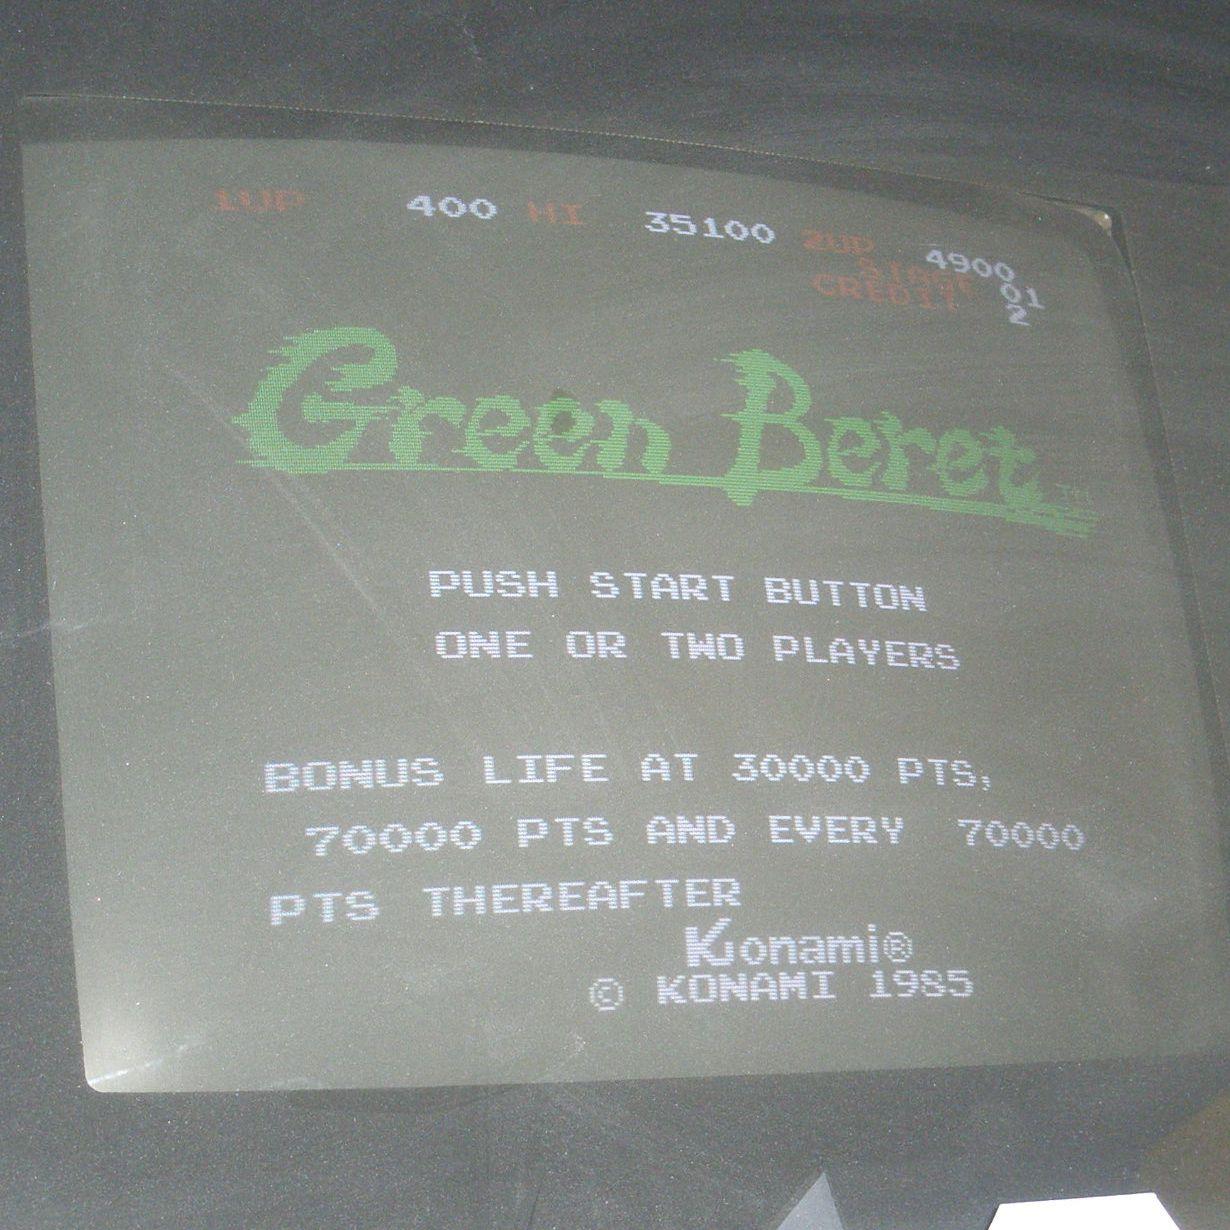 http://arcadius.esero.net/Arcade/Games/Non_Jamma_Fully_Working/Green_Beret_03.jpg